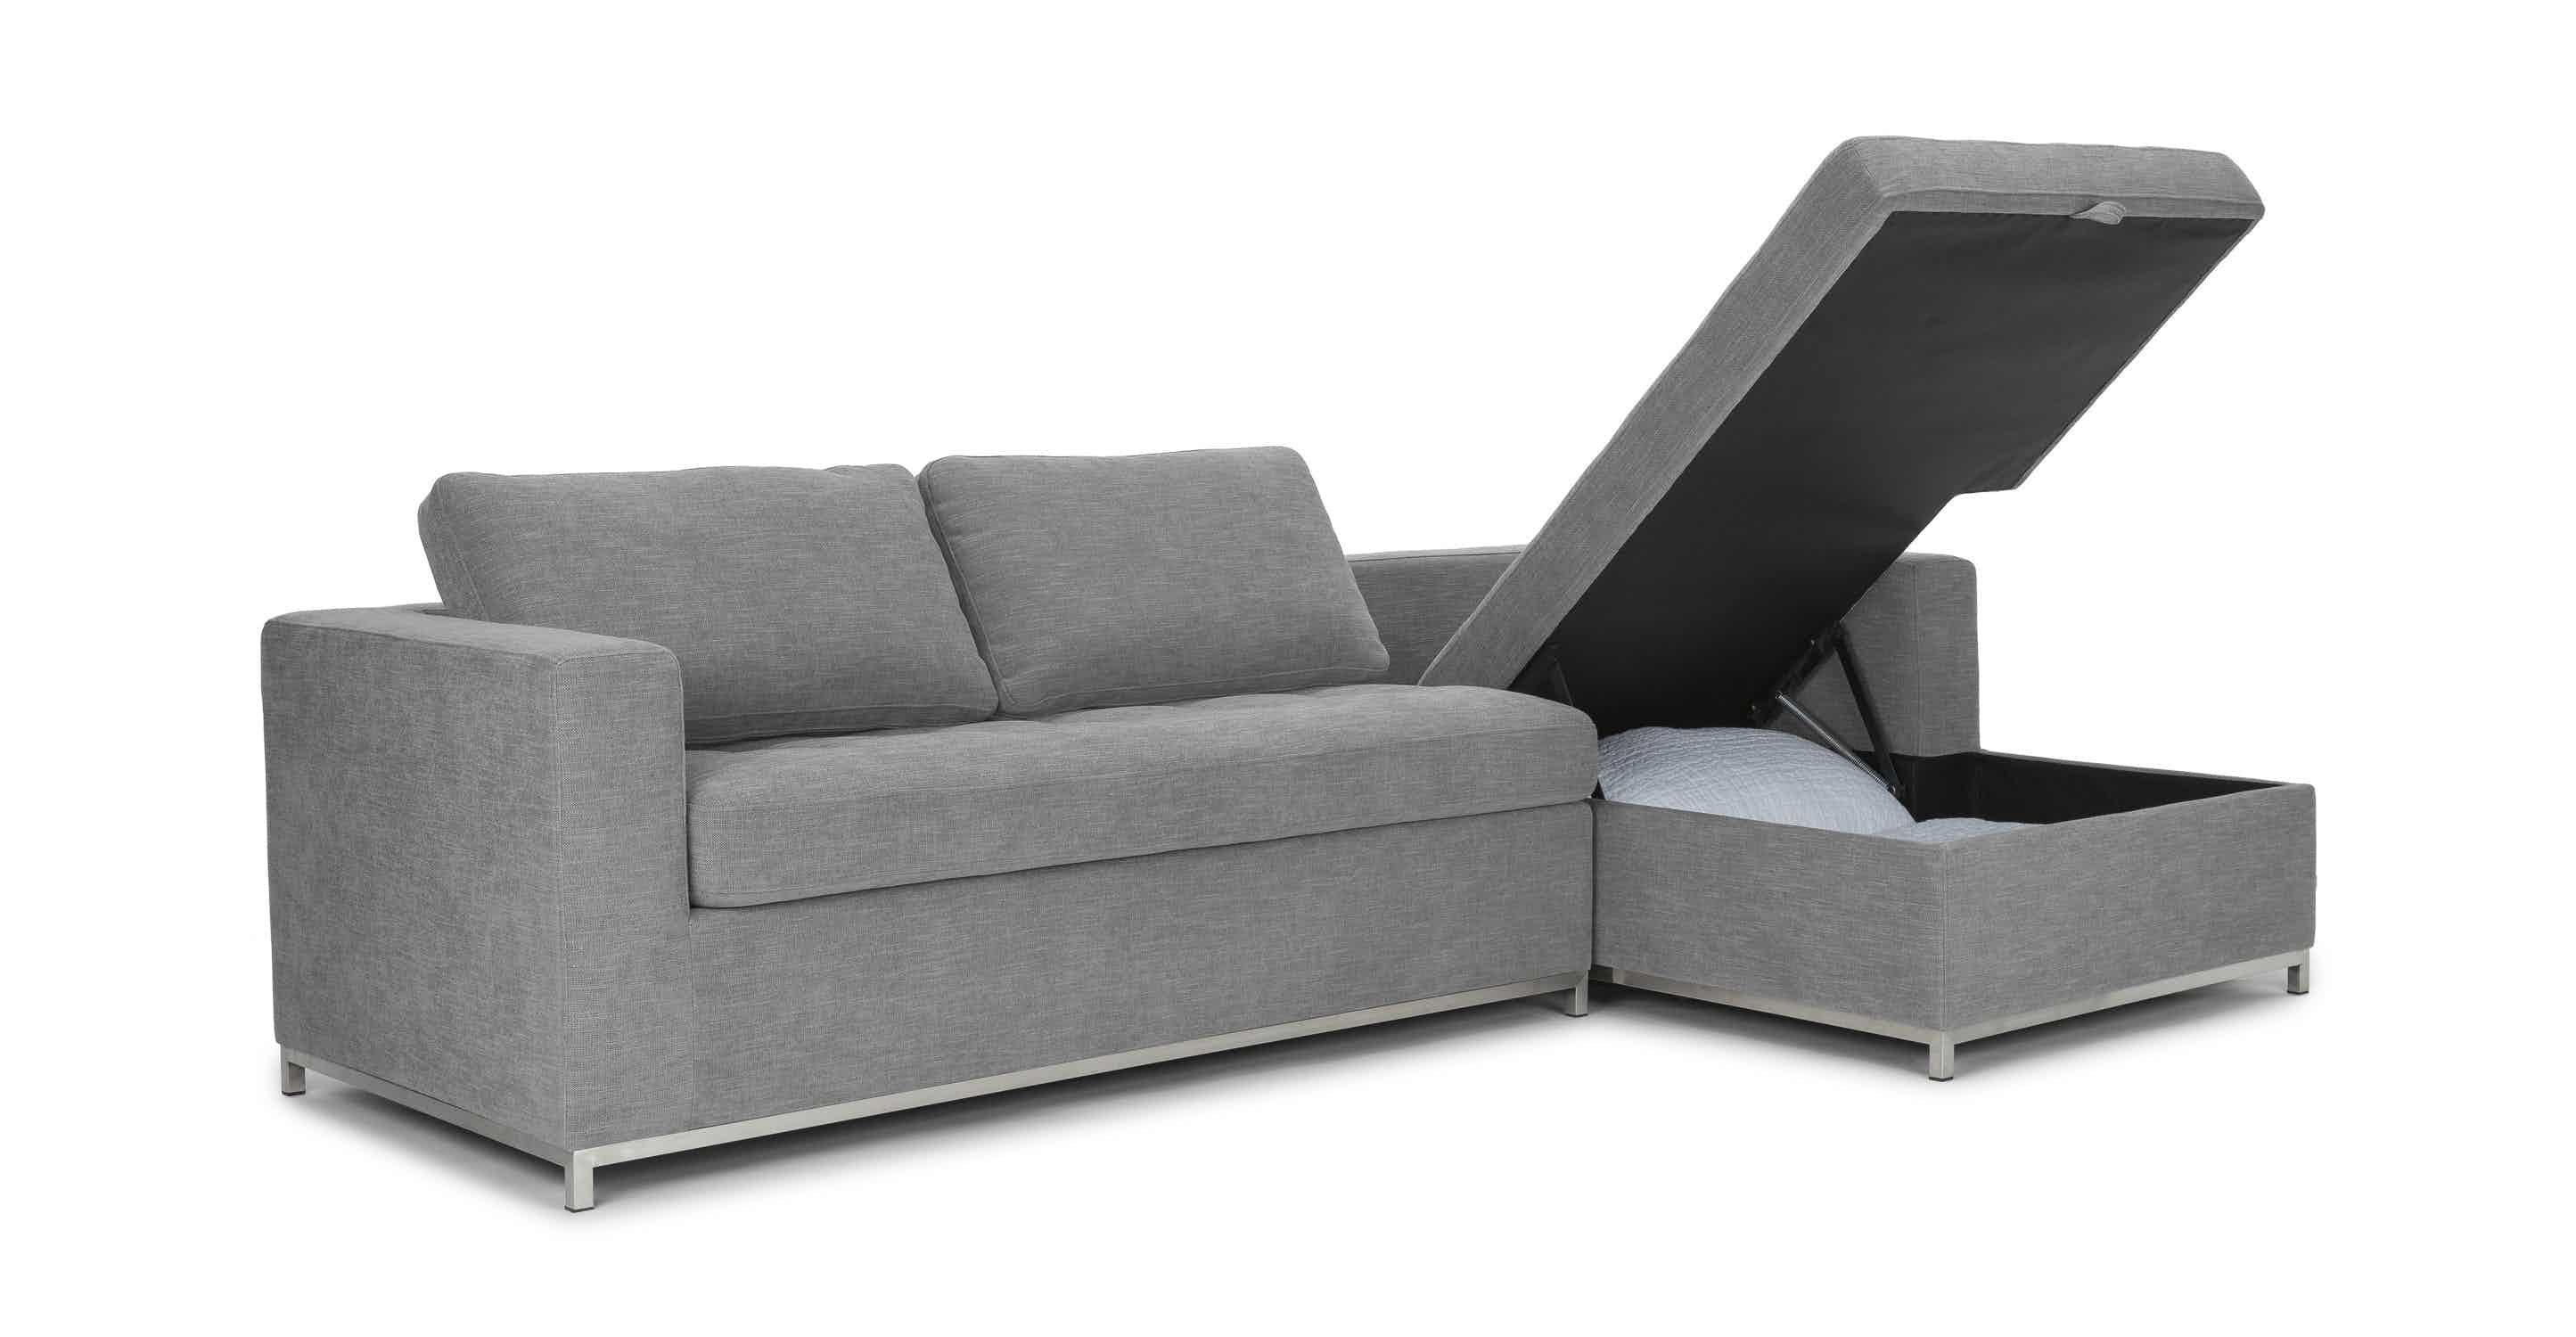 Awe Inspiring Pin On Sofas Sleepers Sectionals Creativecarmelina Interior Chair Design Creativecarmelinacom